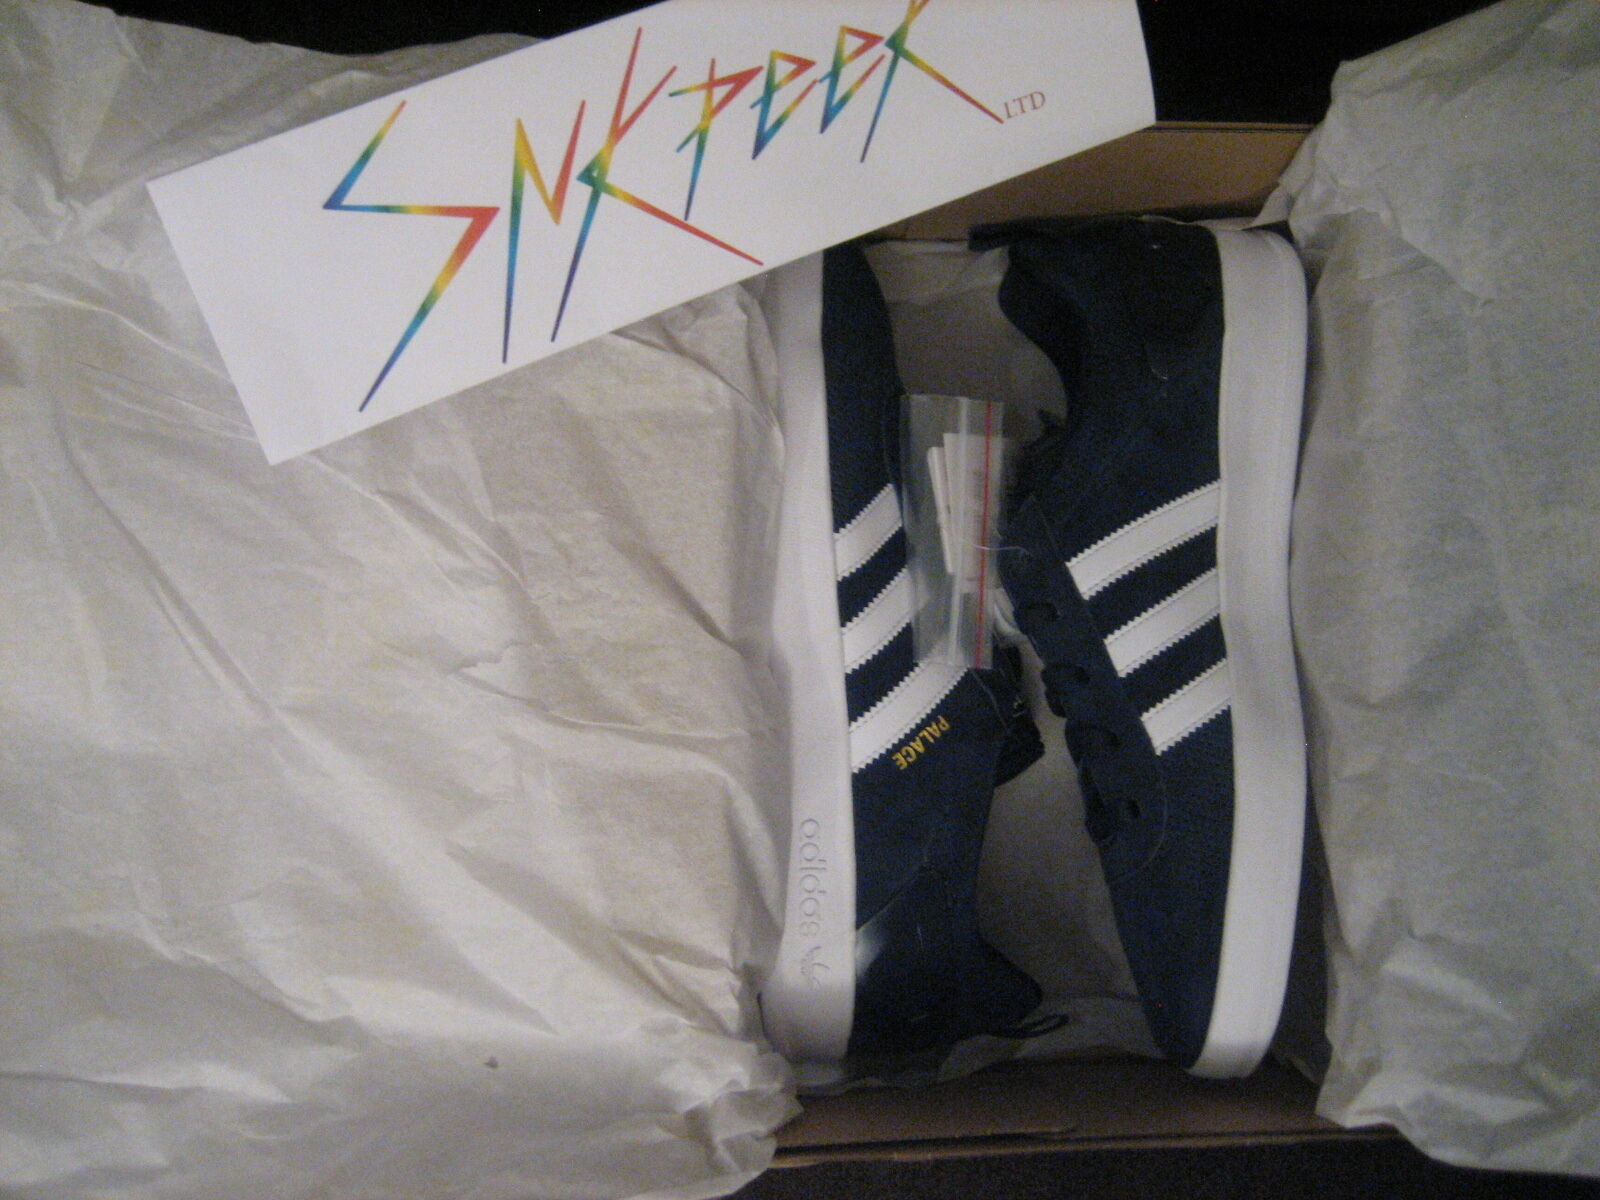 Adidas x Palace Pro Night Indigo / White AQ5147 US Size: 9.5 Supreme